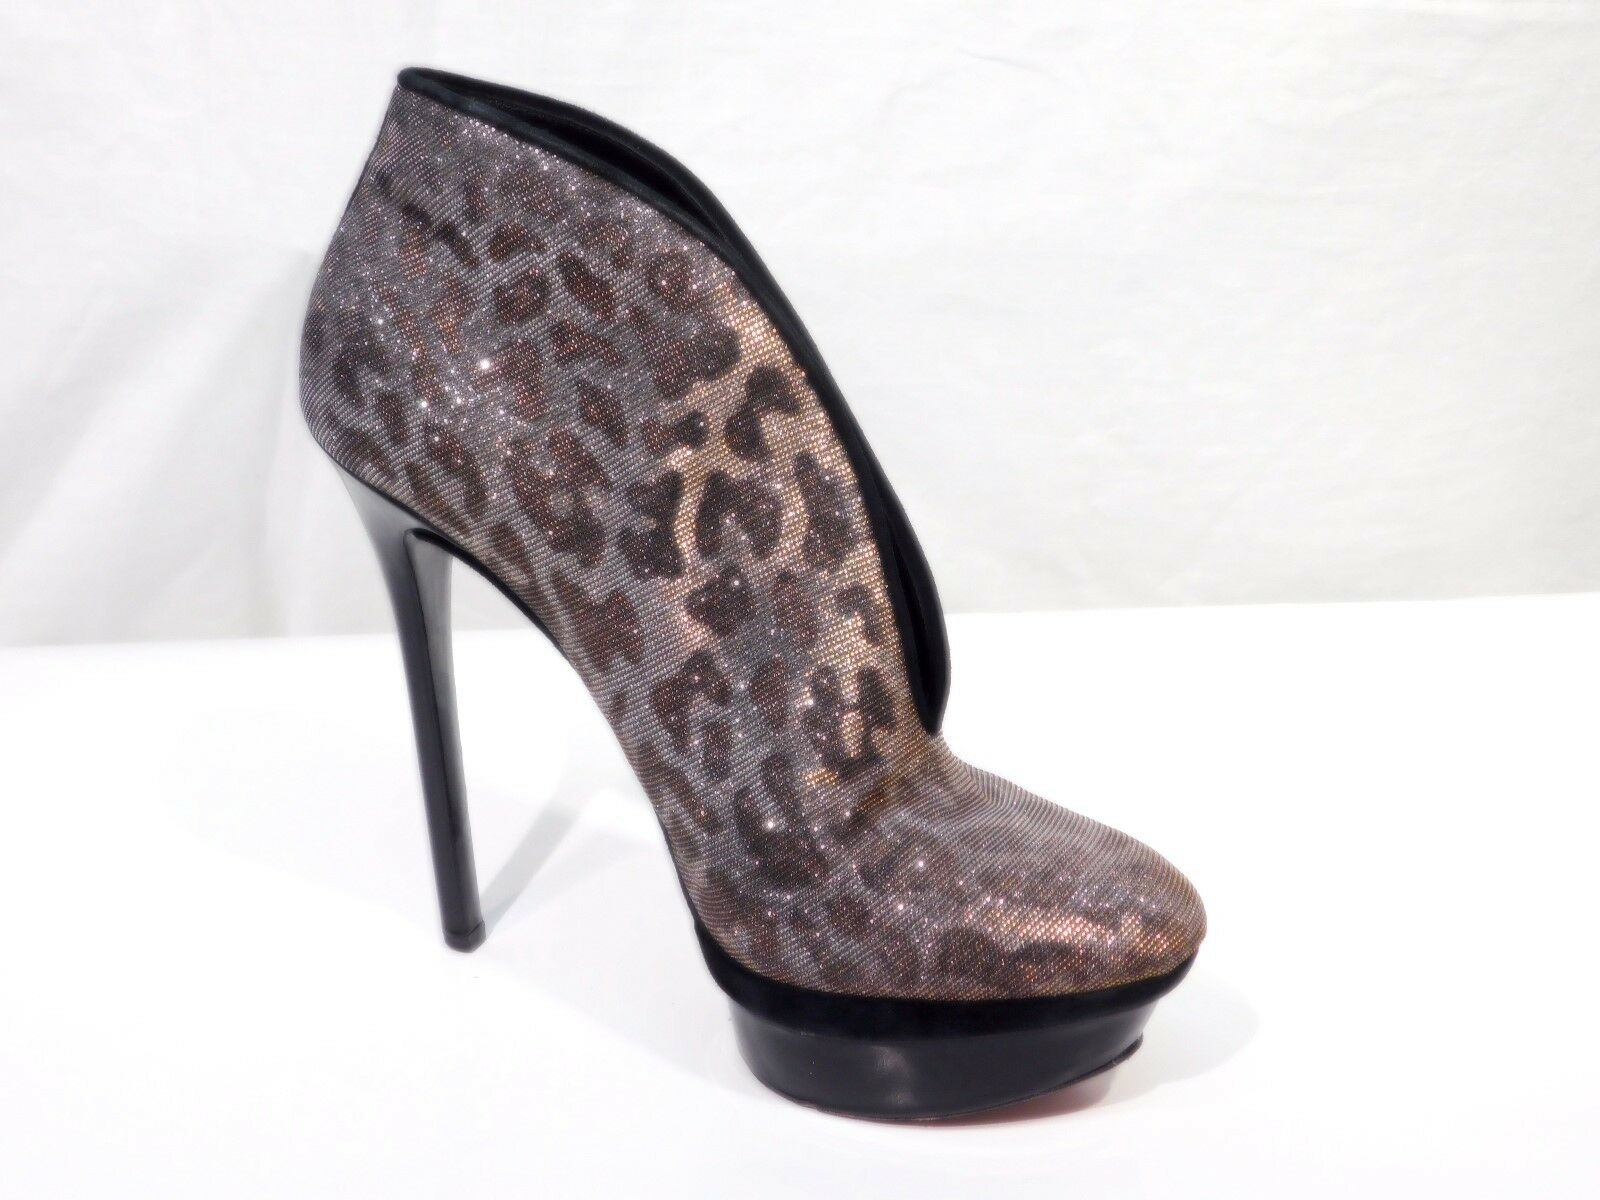 Brian Atwood Pumps 7.5 38 Glitter Metallic Glitter 38 Animal Print Evening Heels 600e8e